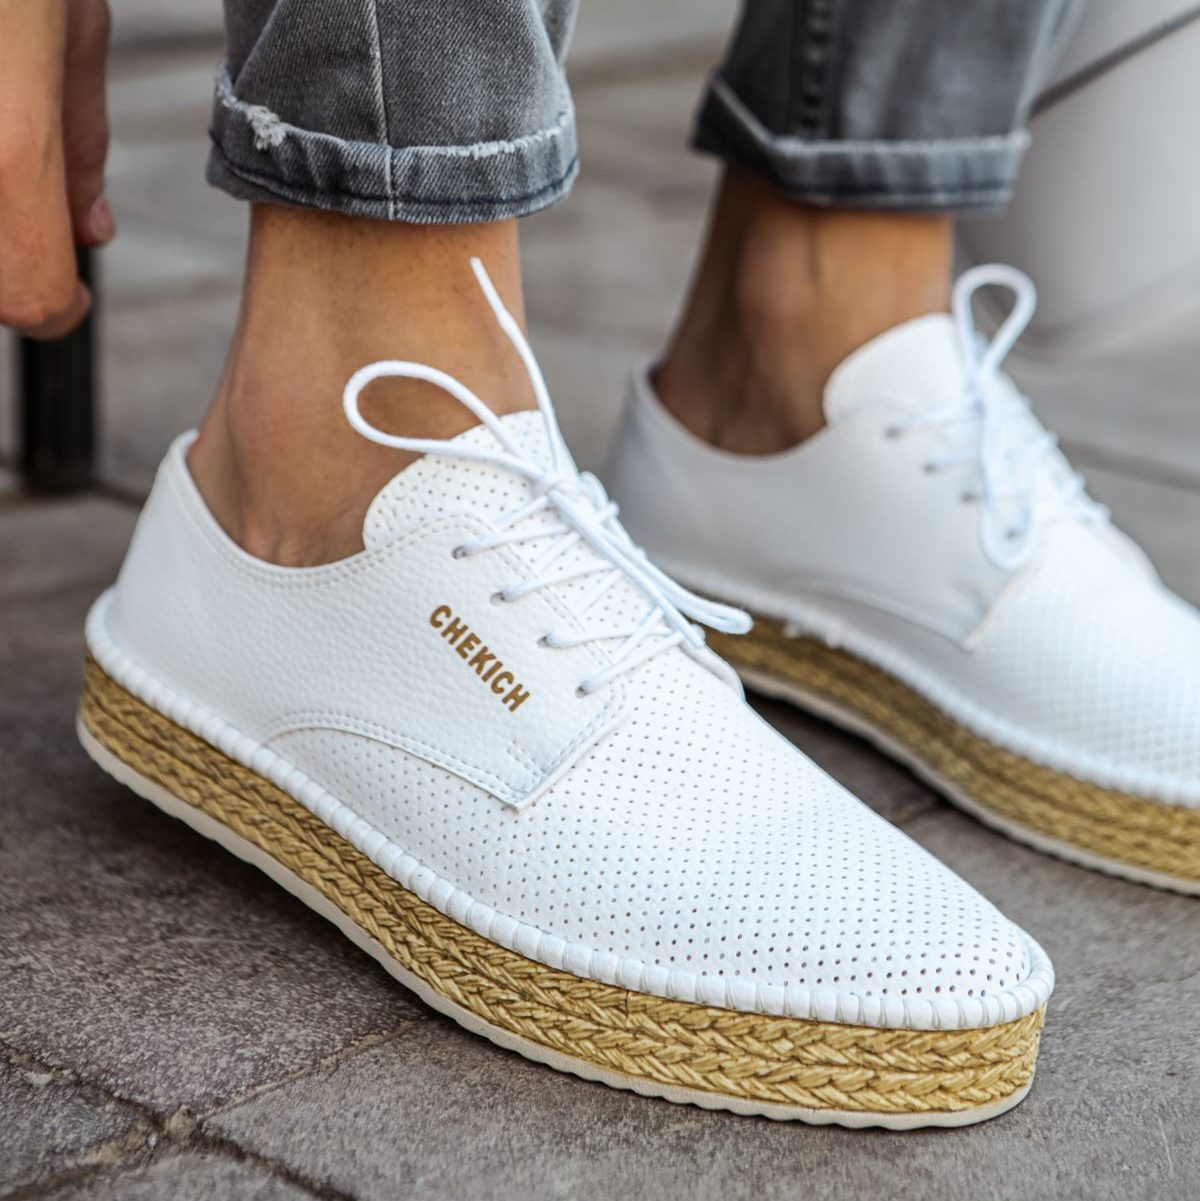 Chekich White Angel Shoes